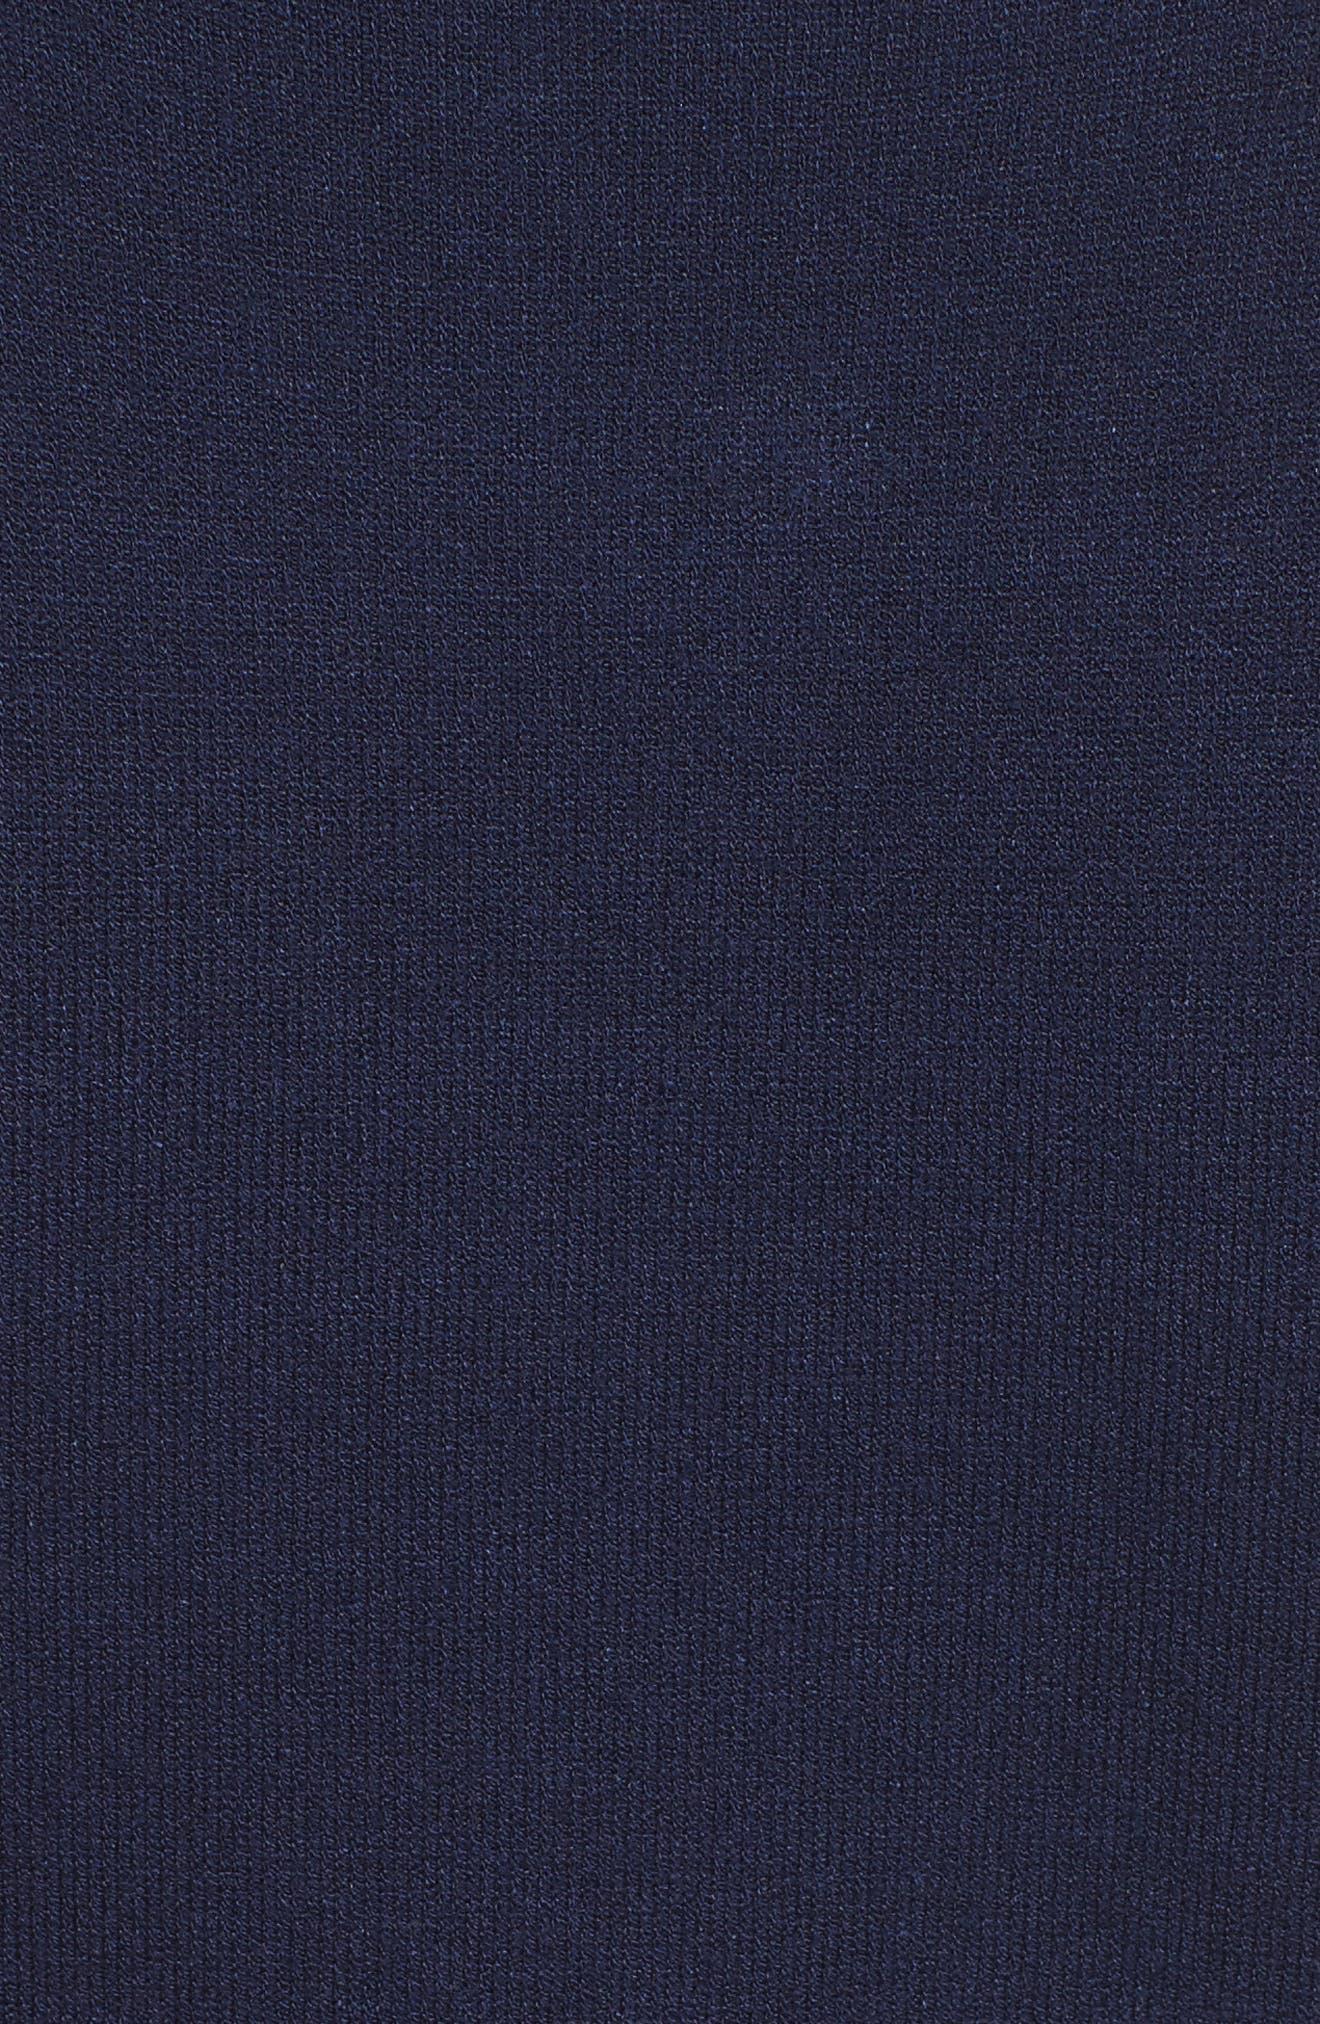 Twist Neck Stretch Knit Sheath Dress,                             Alternate thumbnail 5, color,                             410